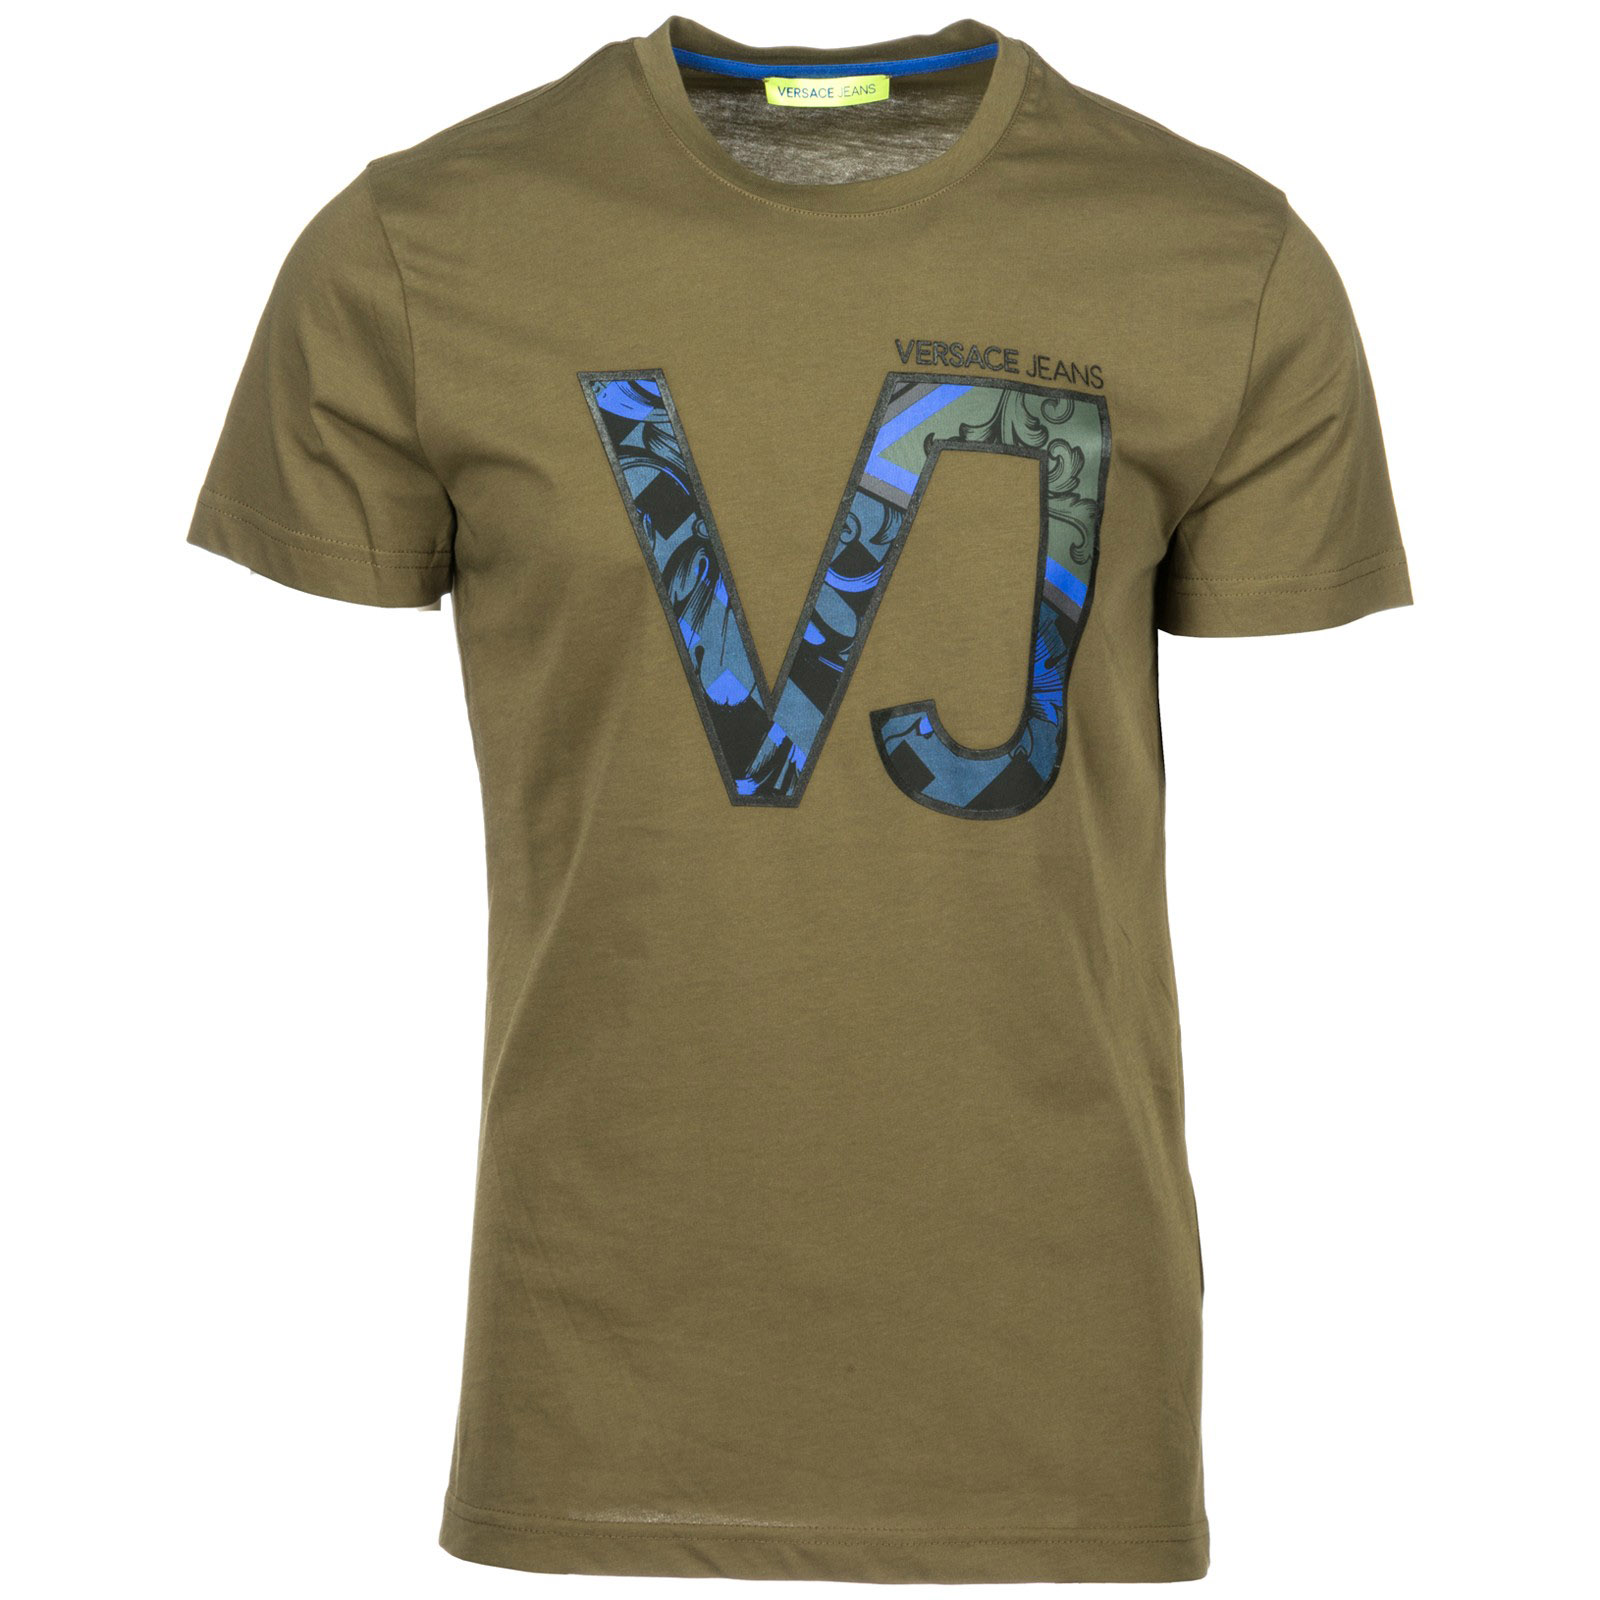 678baa37 Men's short sleeve t-shirt crew neckline jumper ...